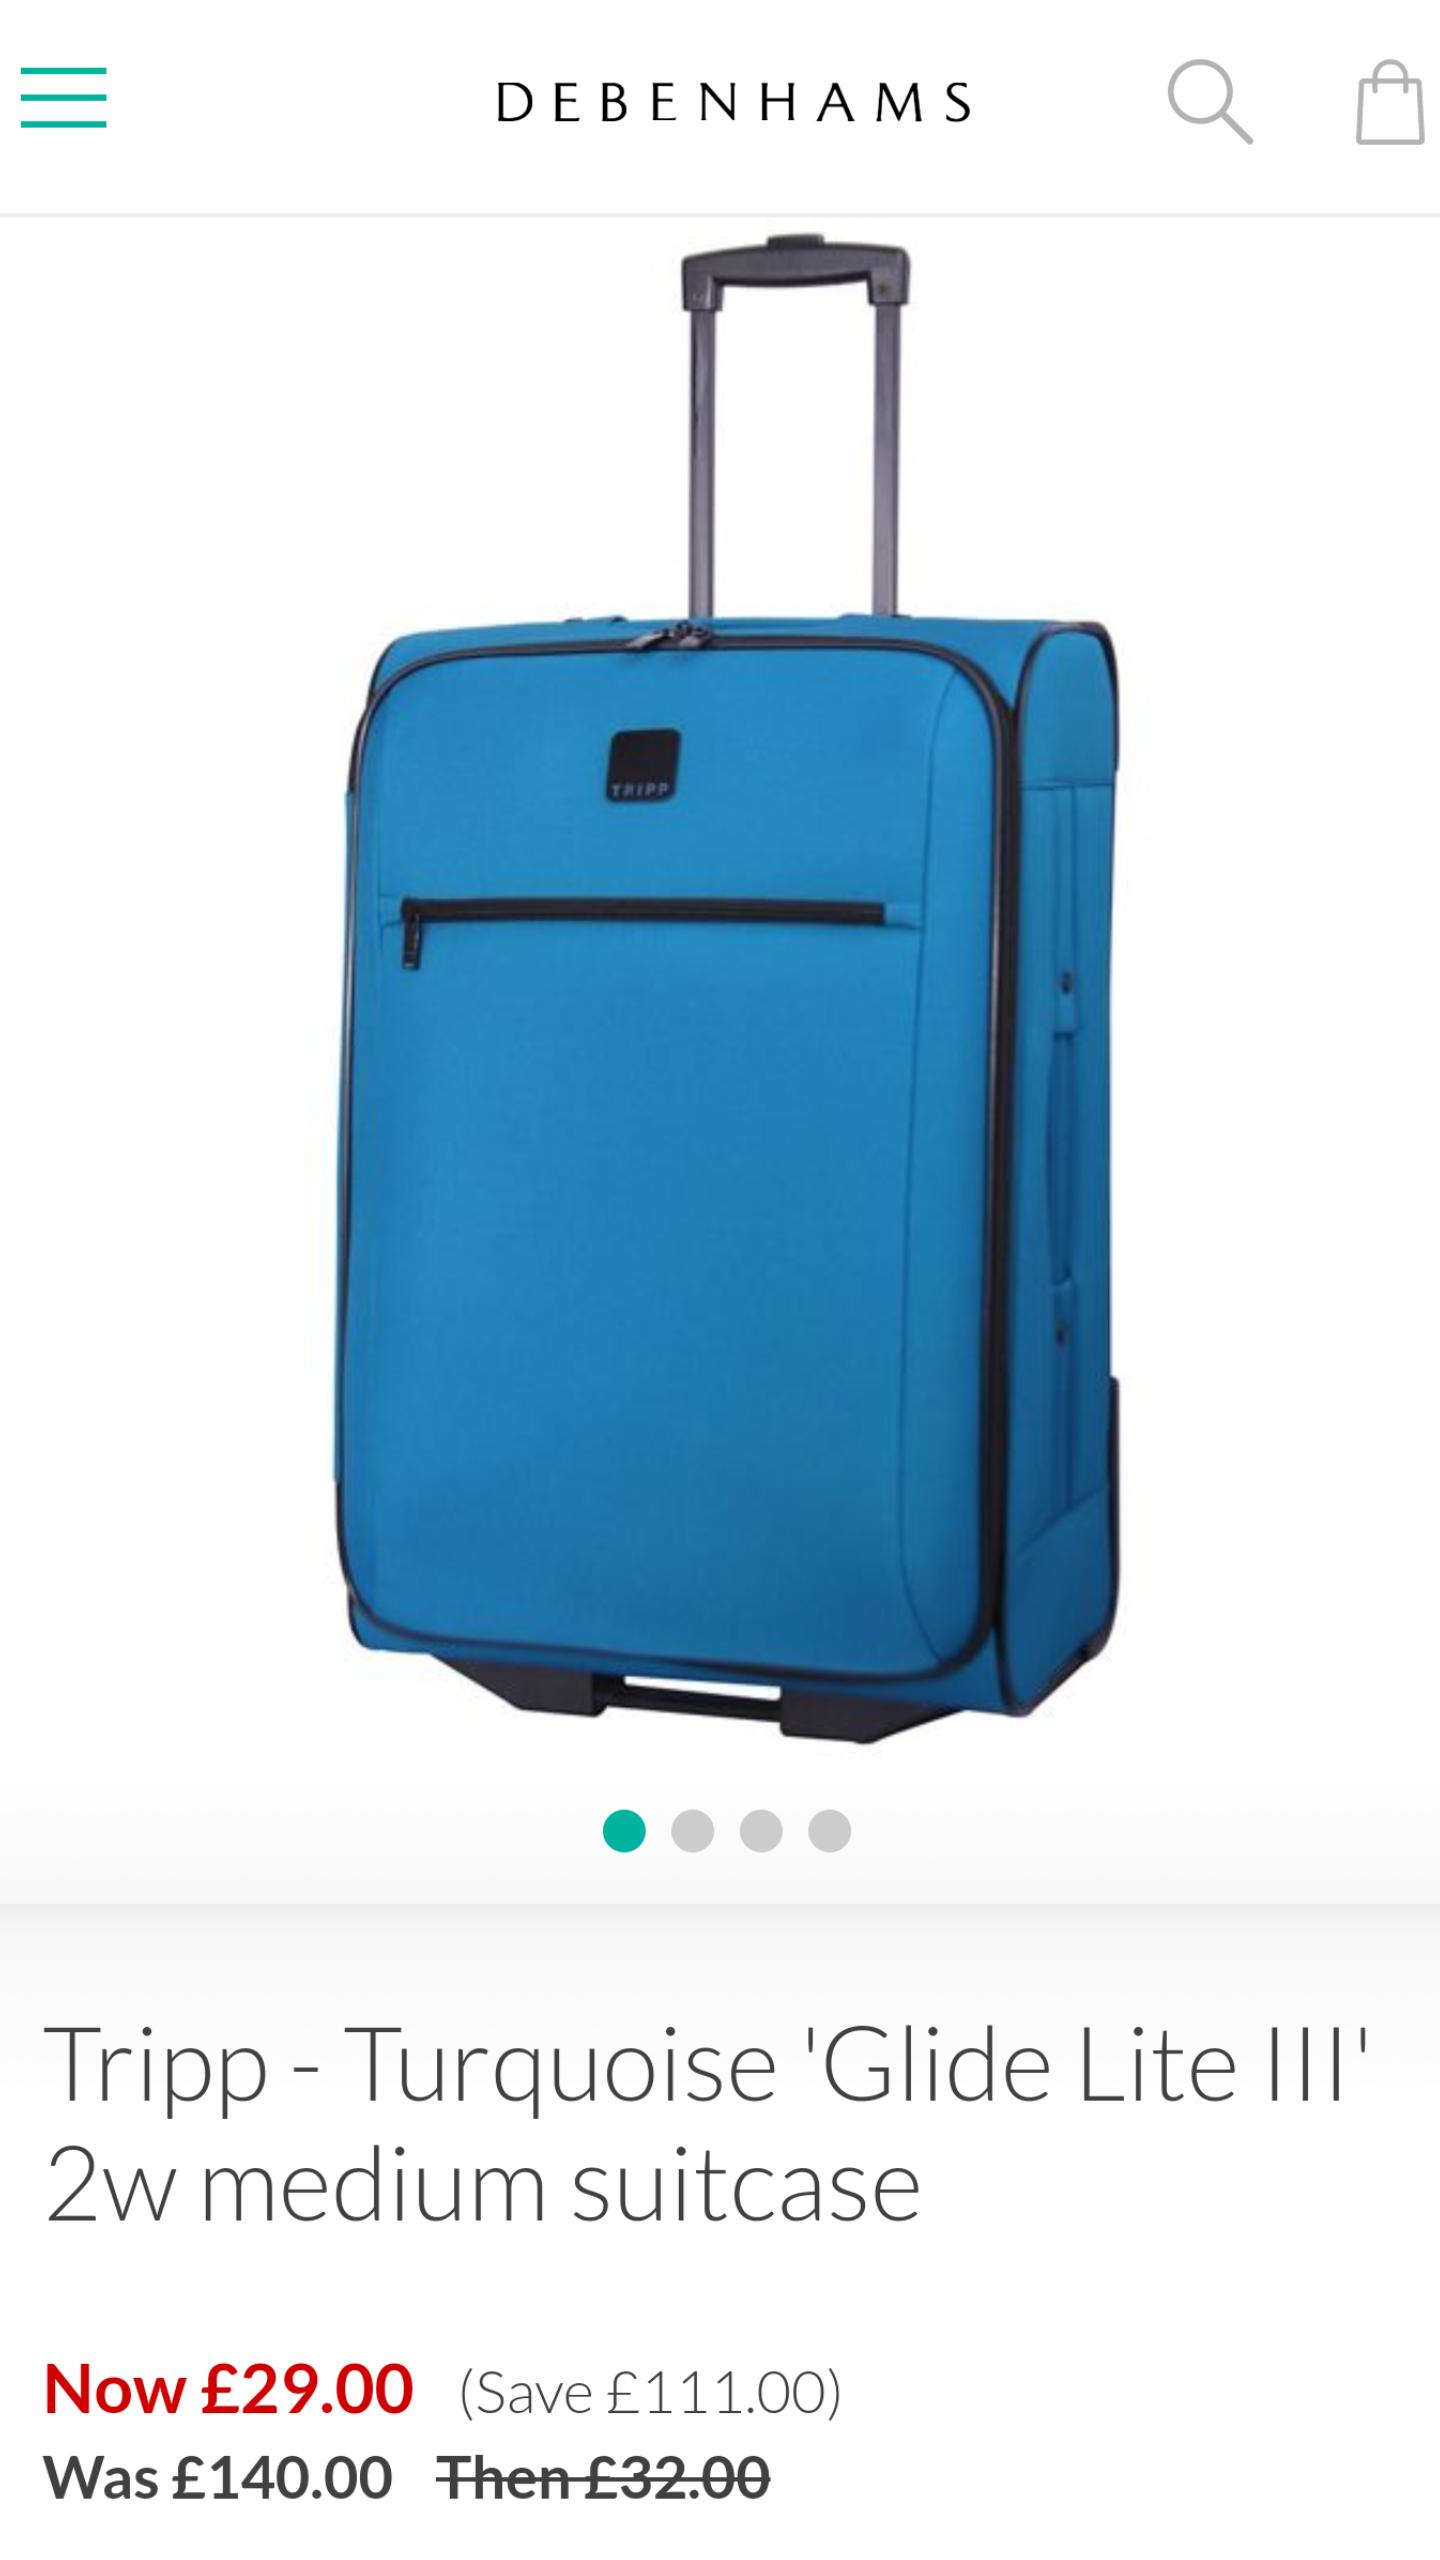 Tripp-Turquoise 'Glide Lite III' 2w medium suitcase - Debenhams - £29